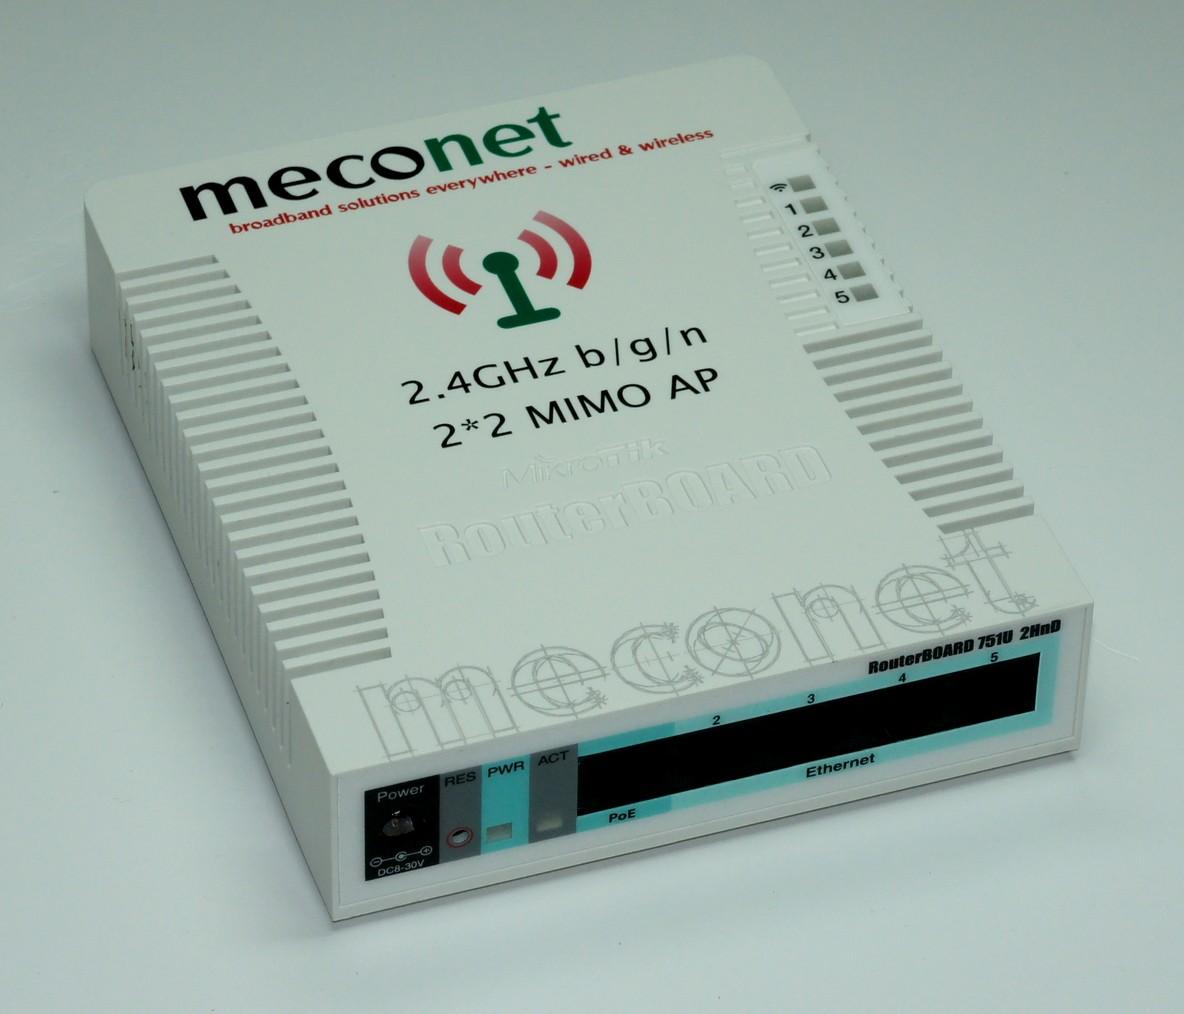 Your Logo On Rb 2x0 7xy 9xy Wap And Similar Meconet Shop Mikrotik 941 2nd Hap Lite